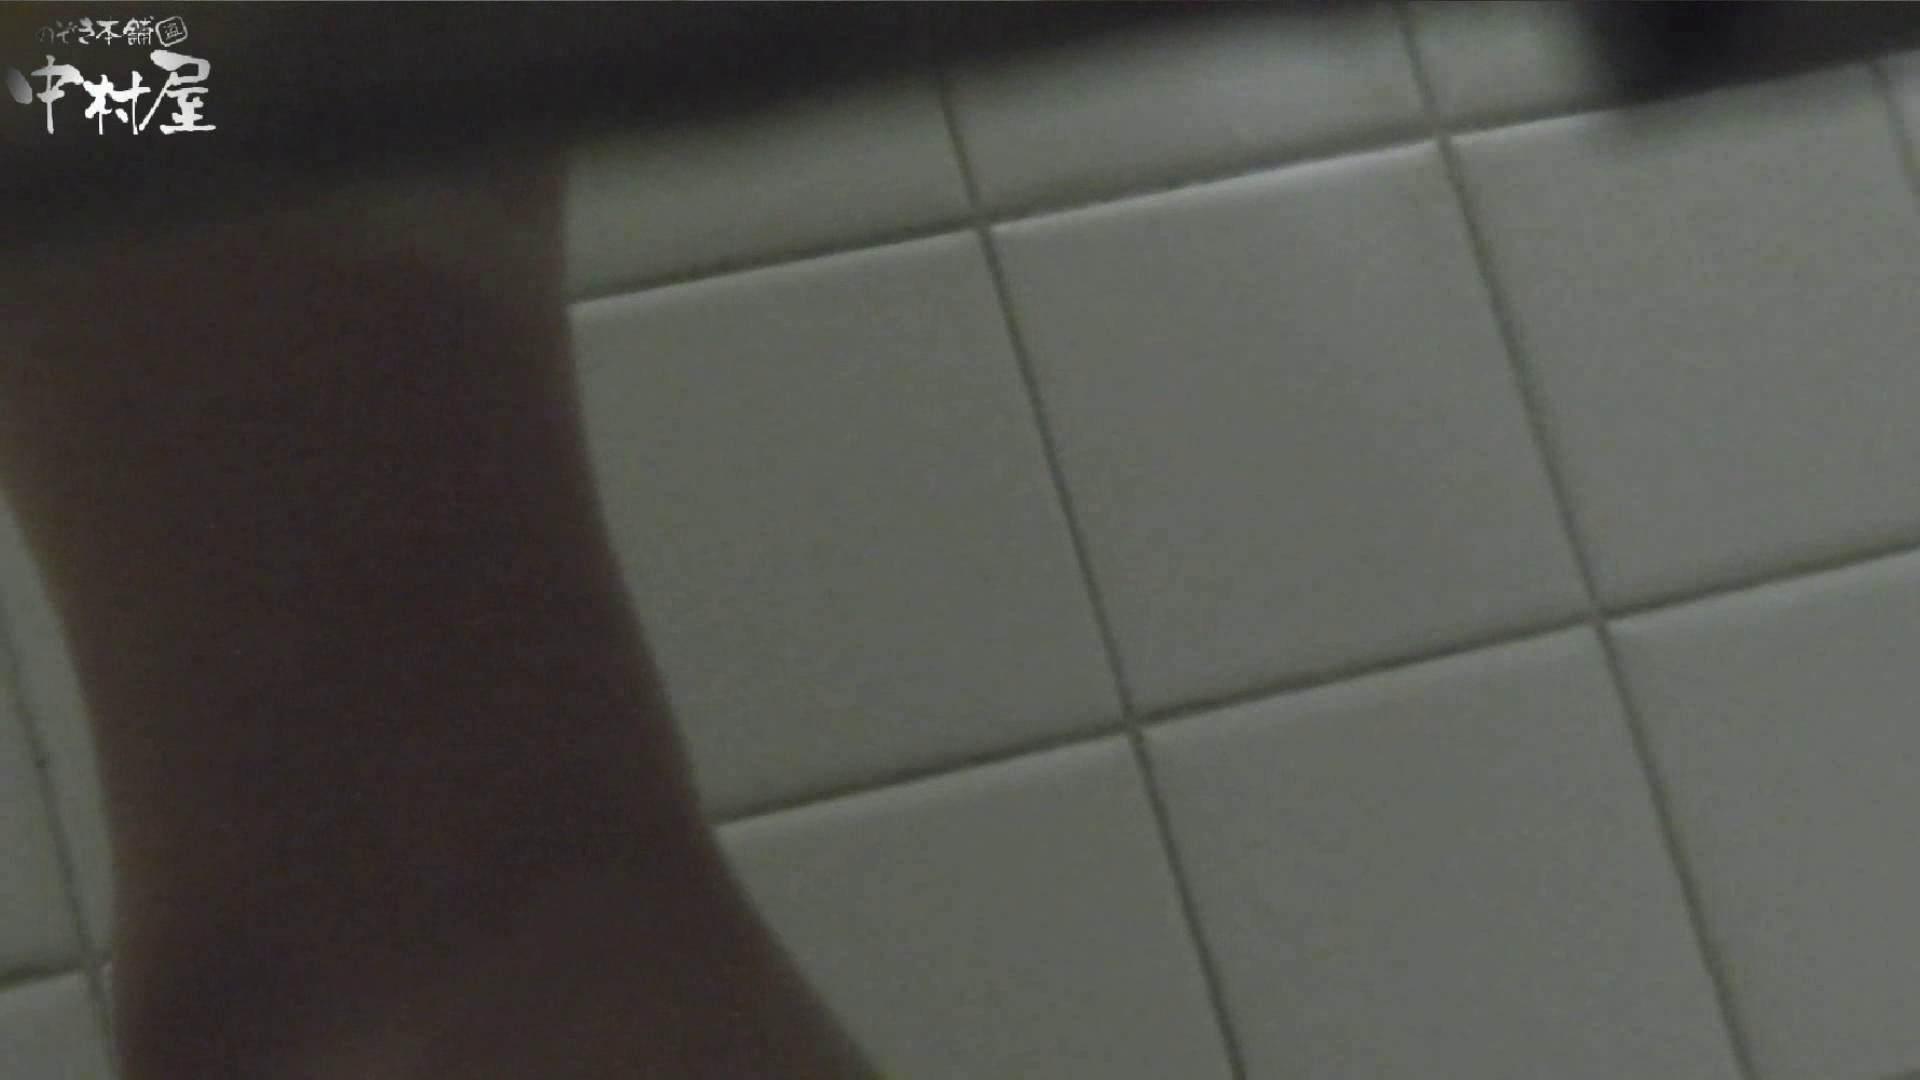 vol.49 命がけ潜伏洗面所! ポニテたんのソフトなブツ・推定180g 潜入シリーズ  74Pix 46